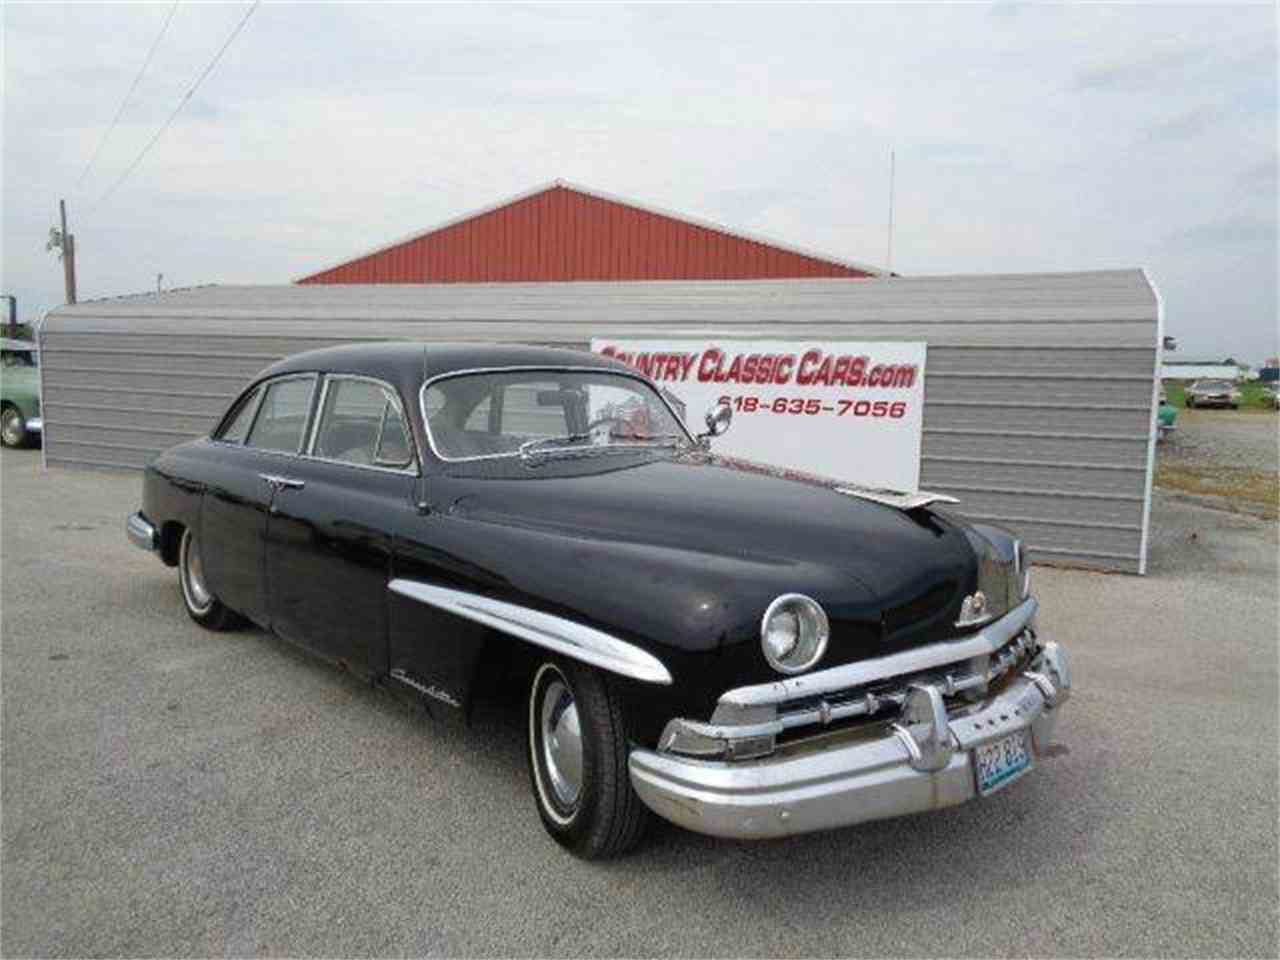 1950 Lincoln Street Rod for Sale   ClassicCars.com   CC-1058512